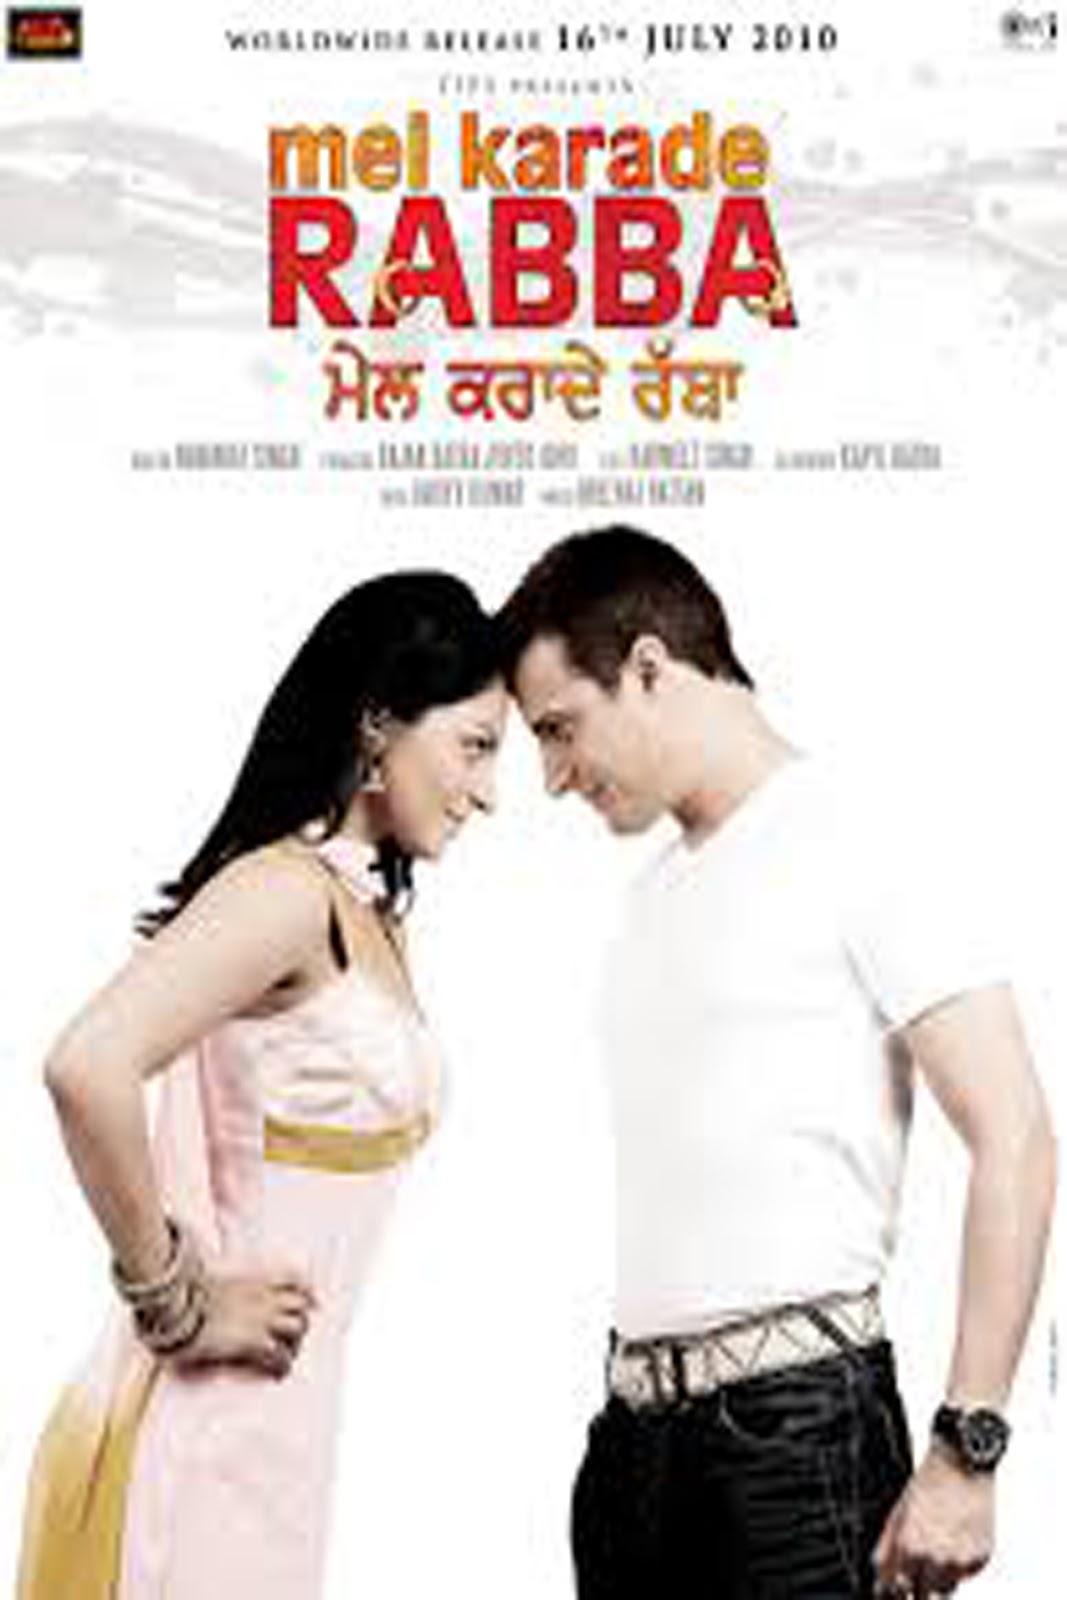 mel karade rabba movie - HD900×1200